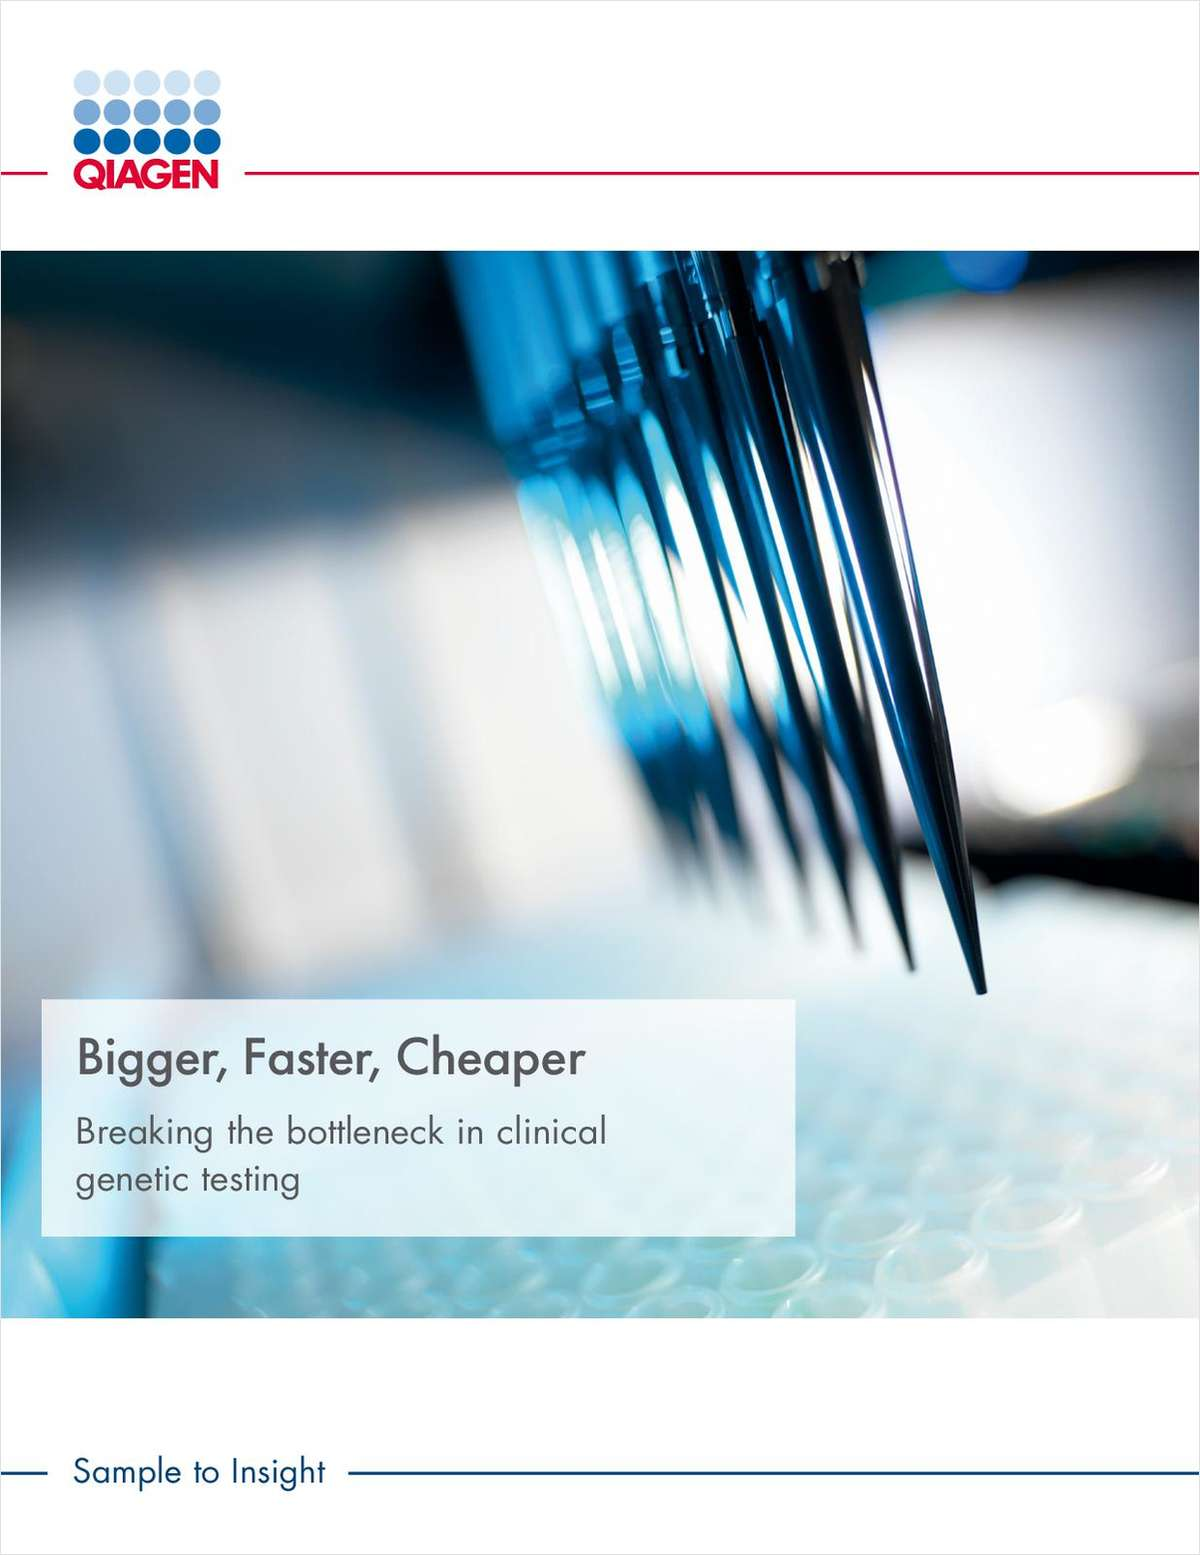 Bigger, Faster, Cheaper: Breaking the Bottleneck in Clinical Genetic Testing